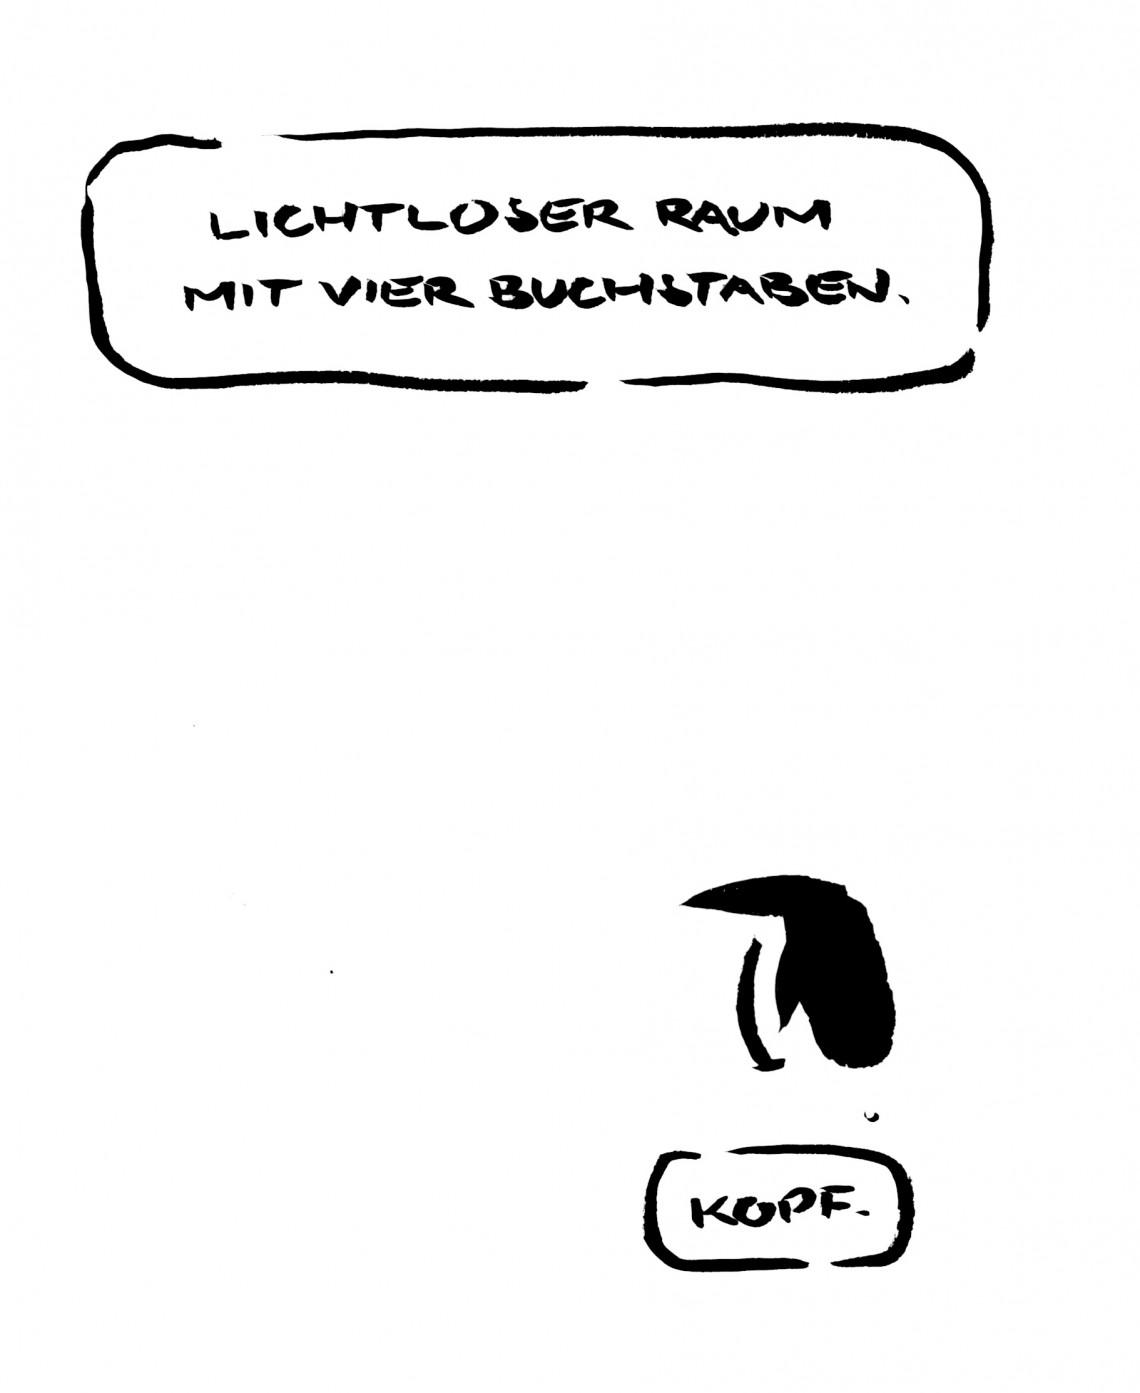 083_kopf